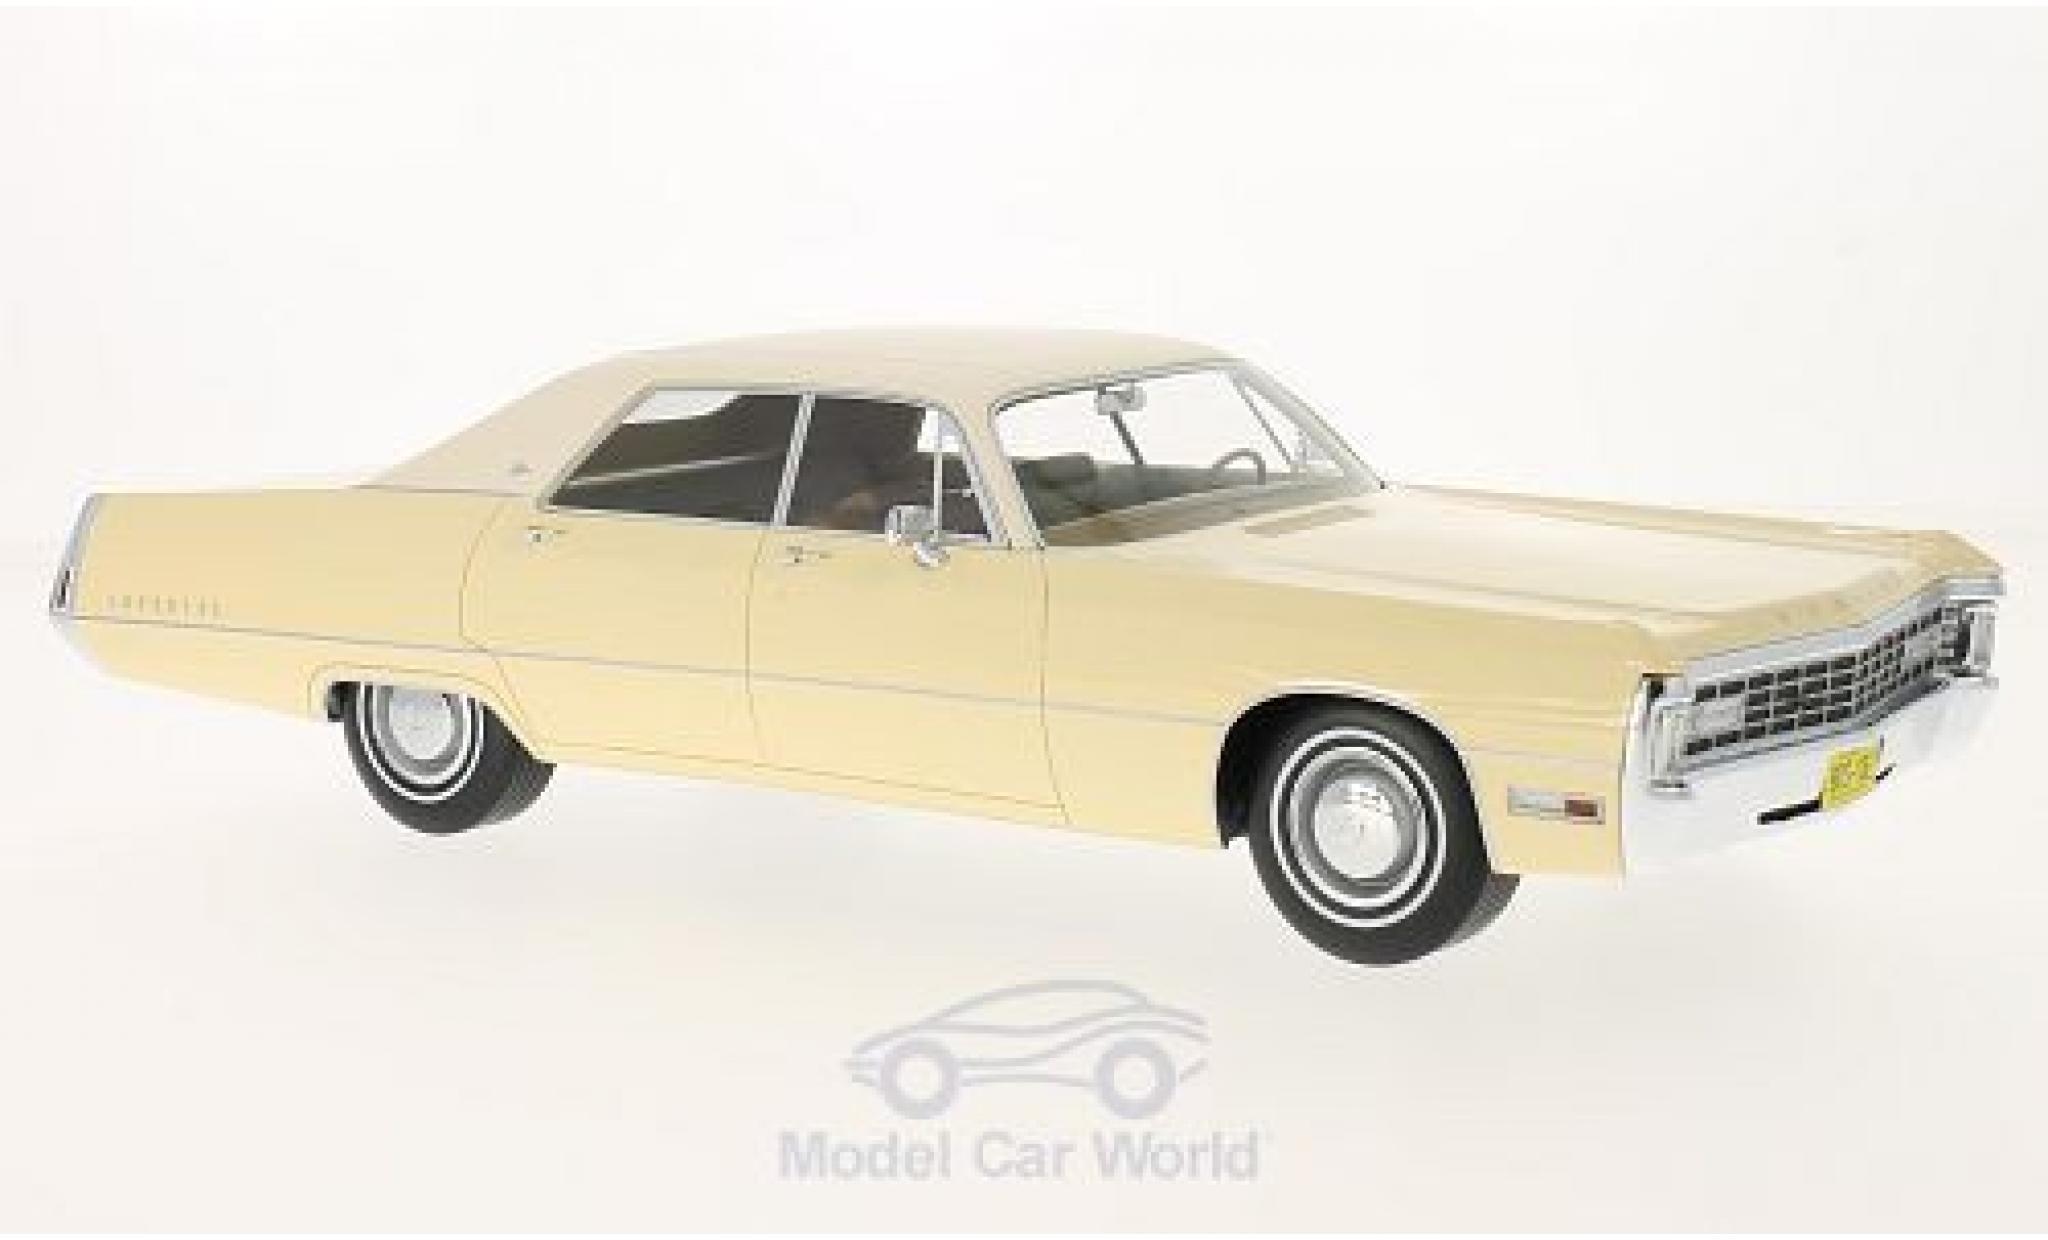 Chrysler Imperial 1/18 BoS Models LeBaron 4-door Hardtop dunkelbeige/hellbeige 1971